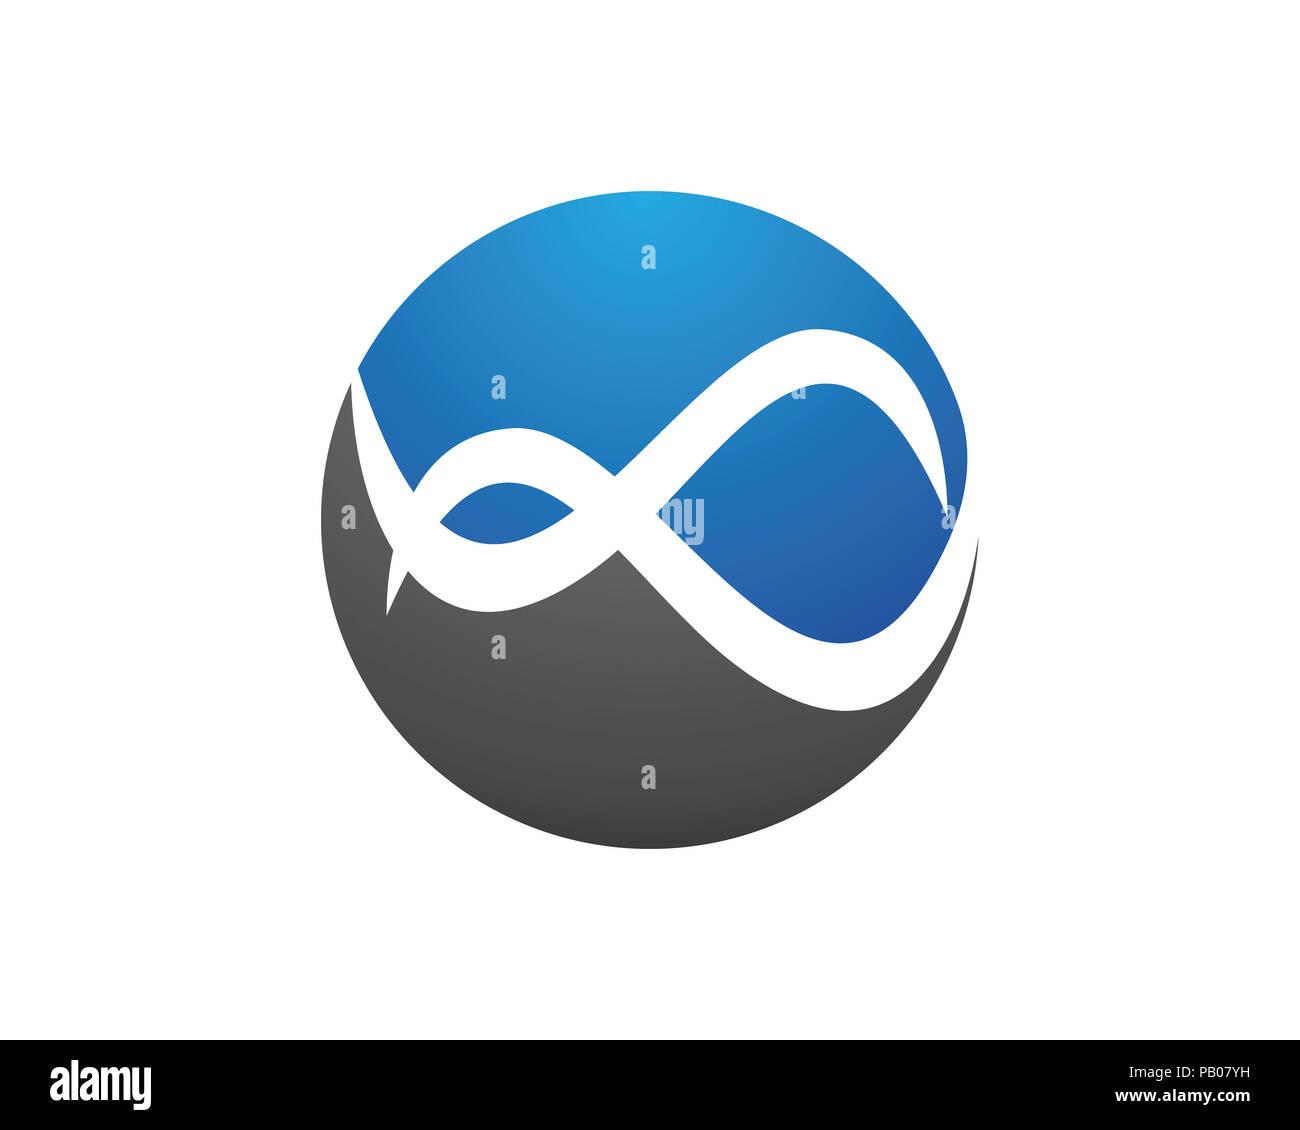 Infinity Design Infinity Logo Vector Logo Template Stock Photo